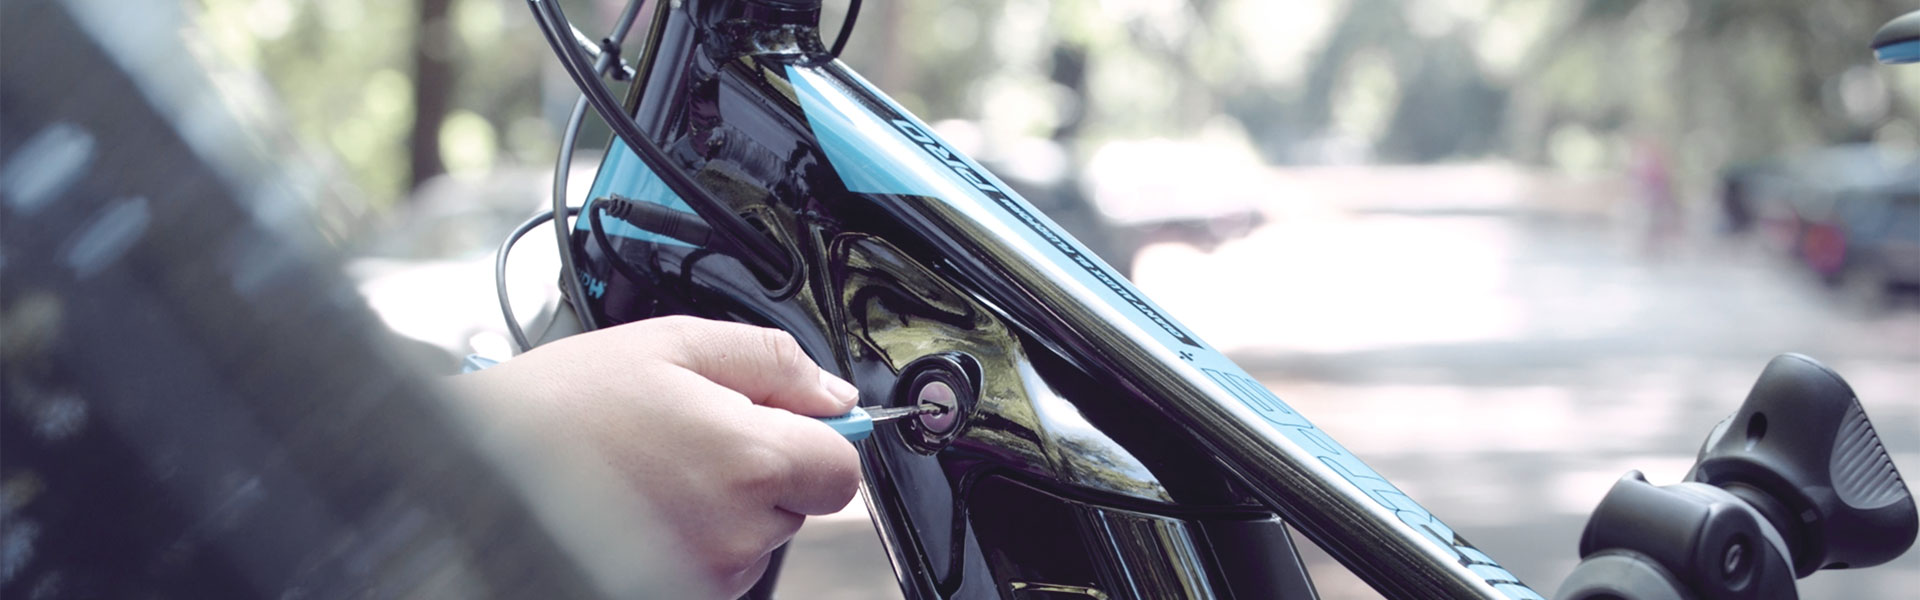 E-kolesa tovorni vodič